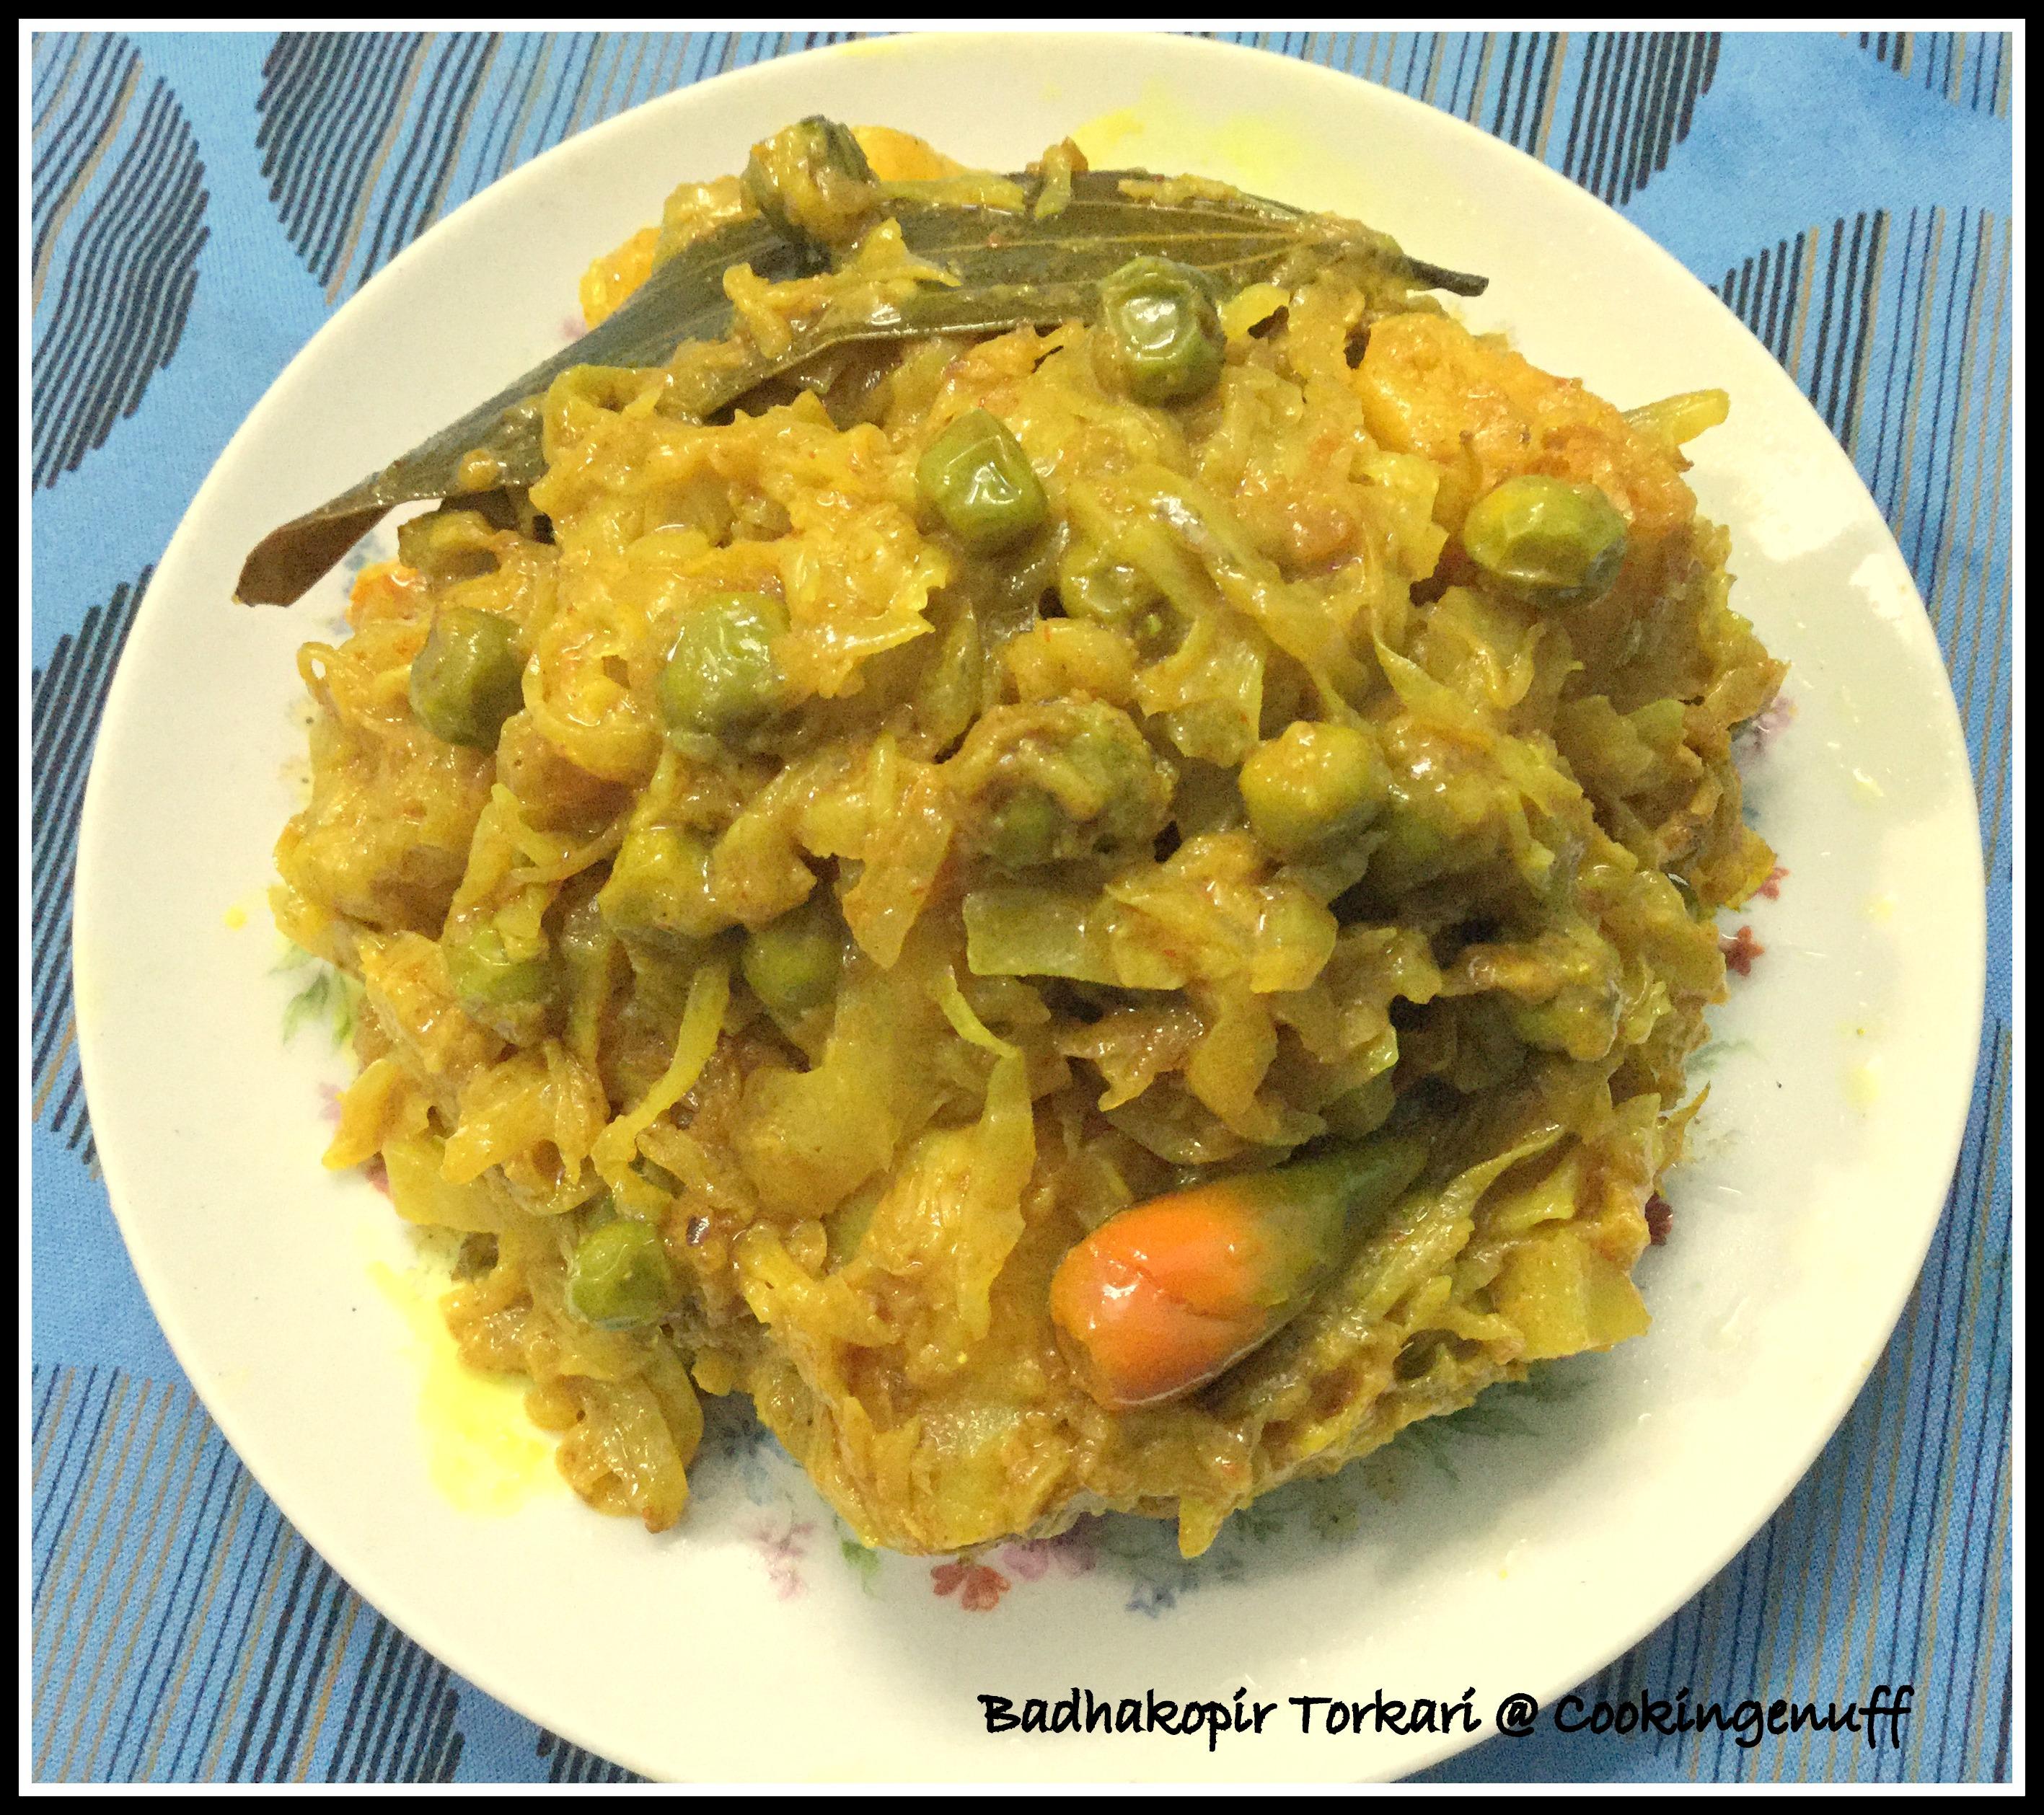 Dry Cabbage Curry / Bandhakopir Tarkari /Cabbage With Peas